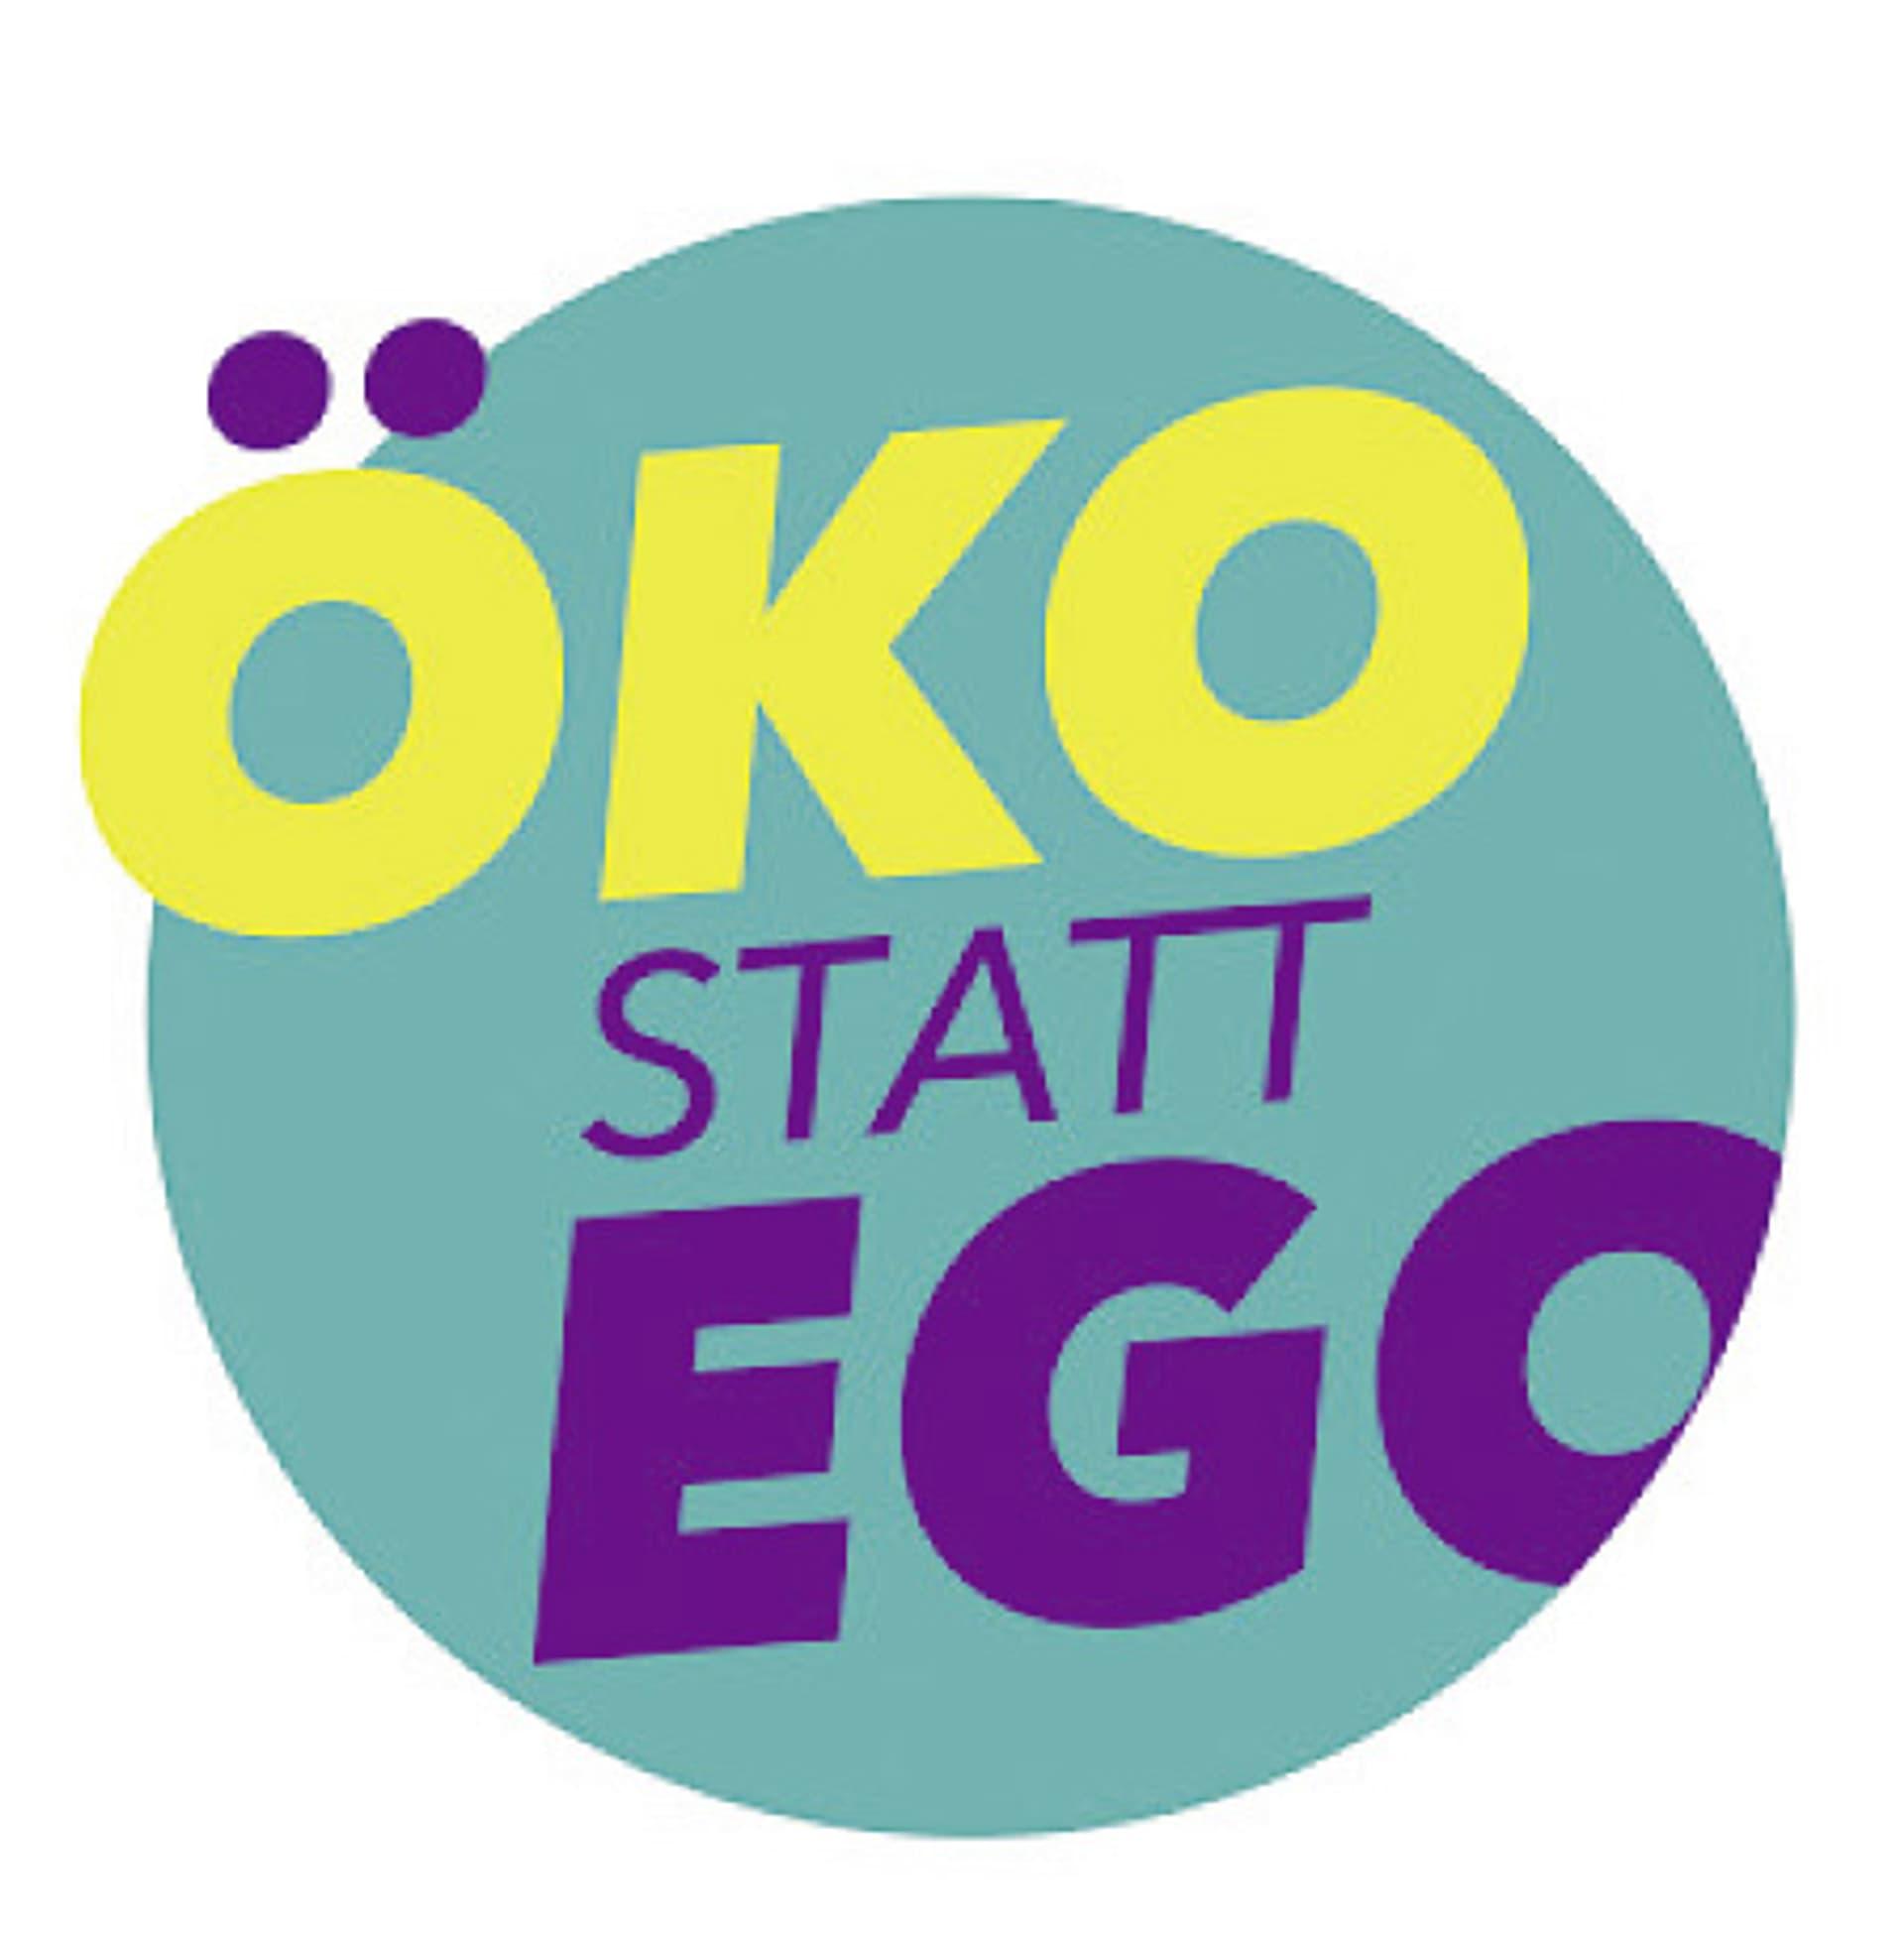 Oeko statt ego logo